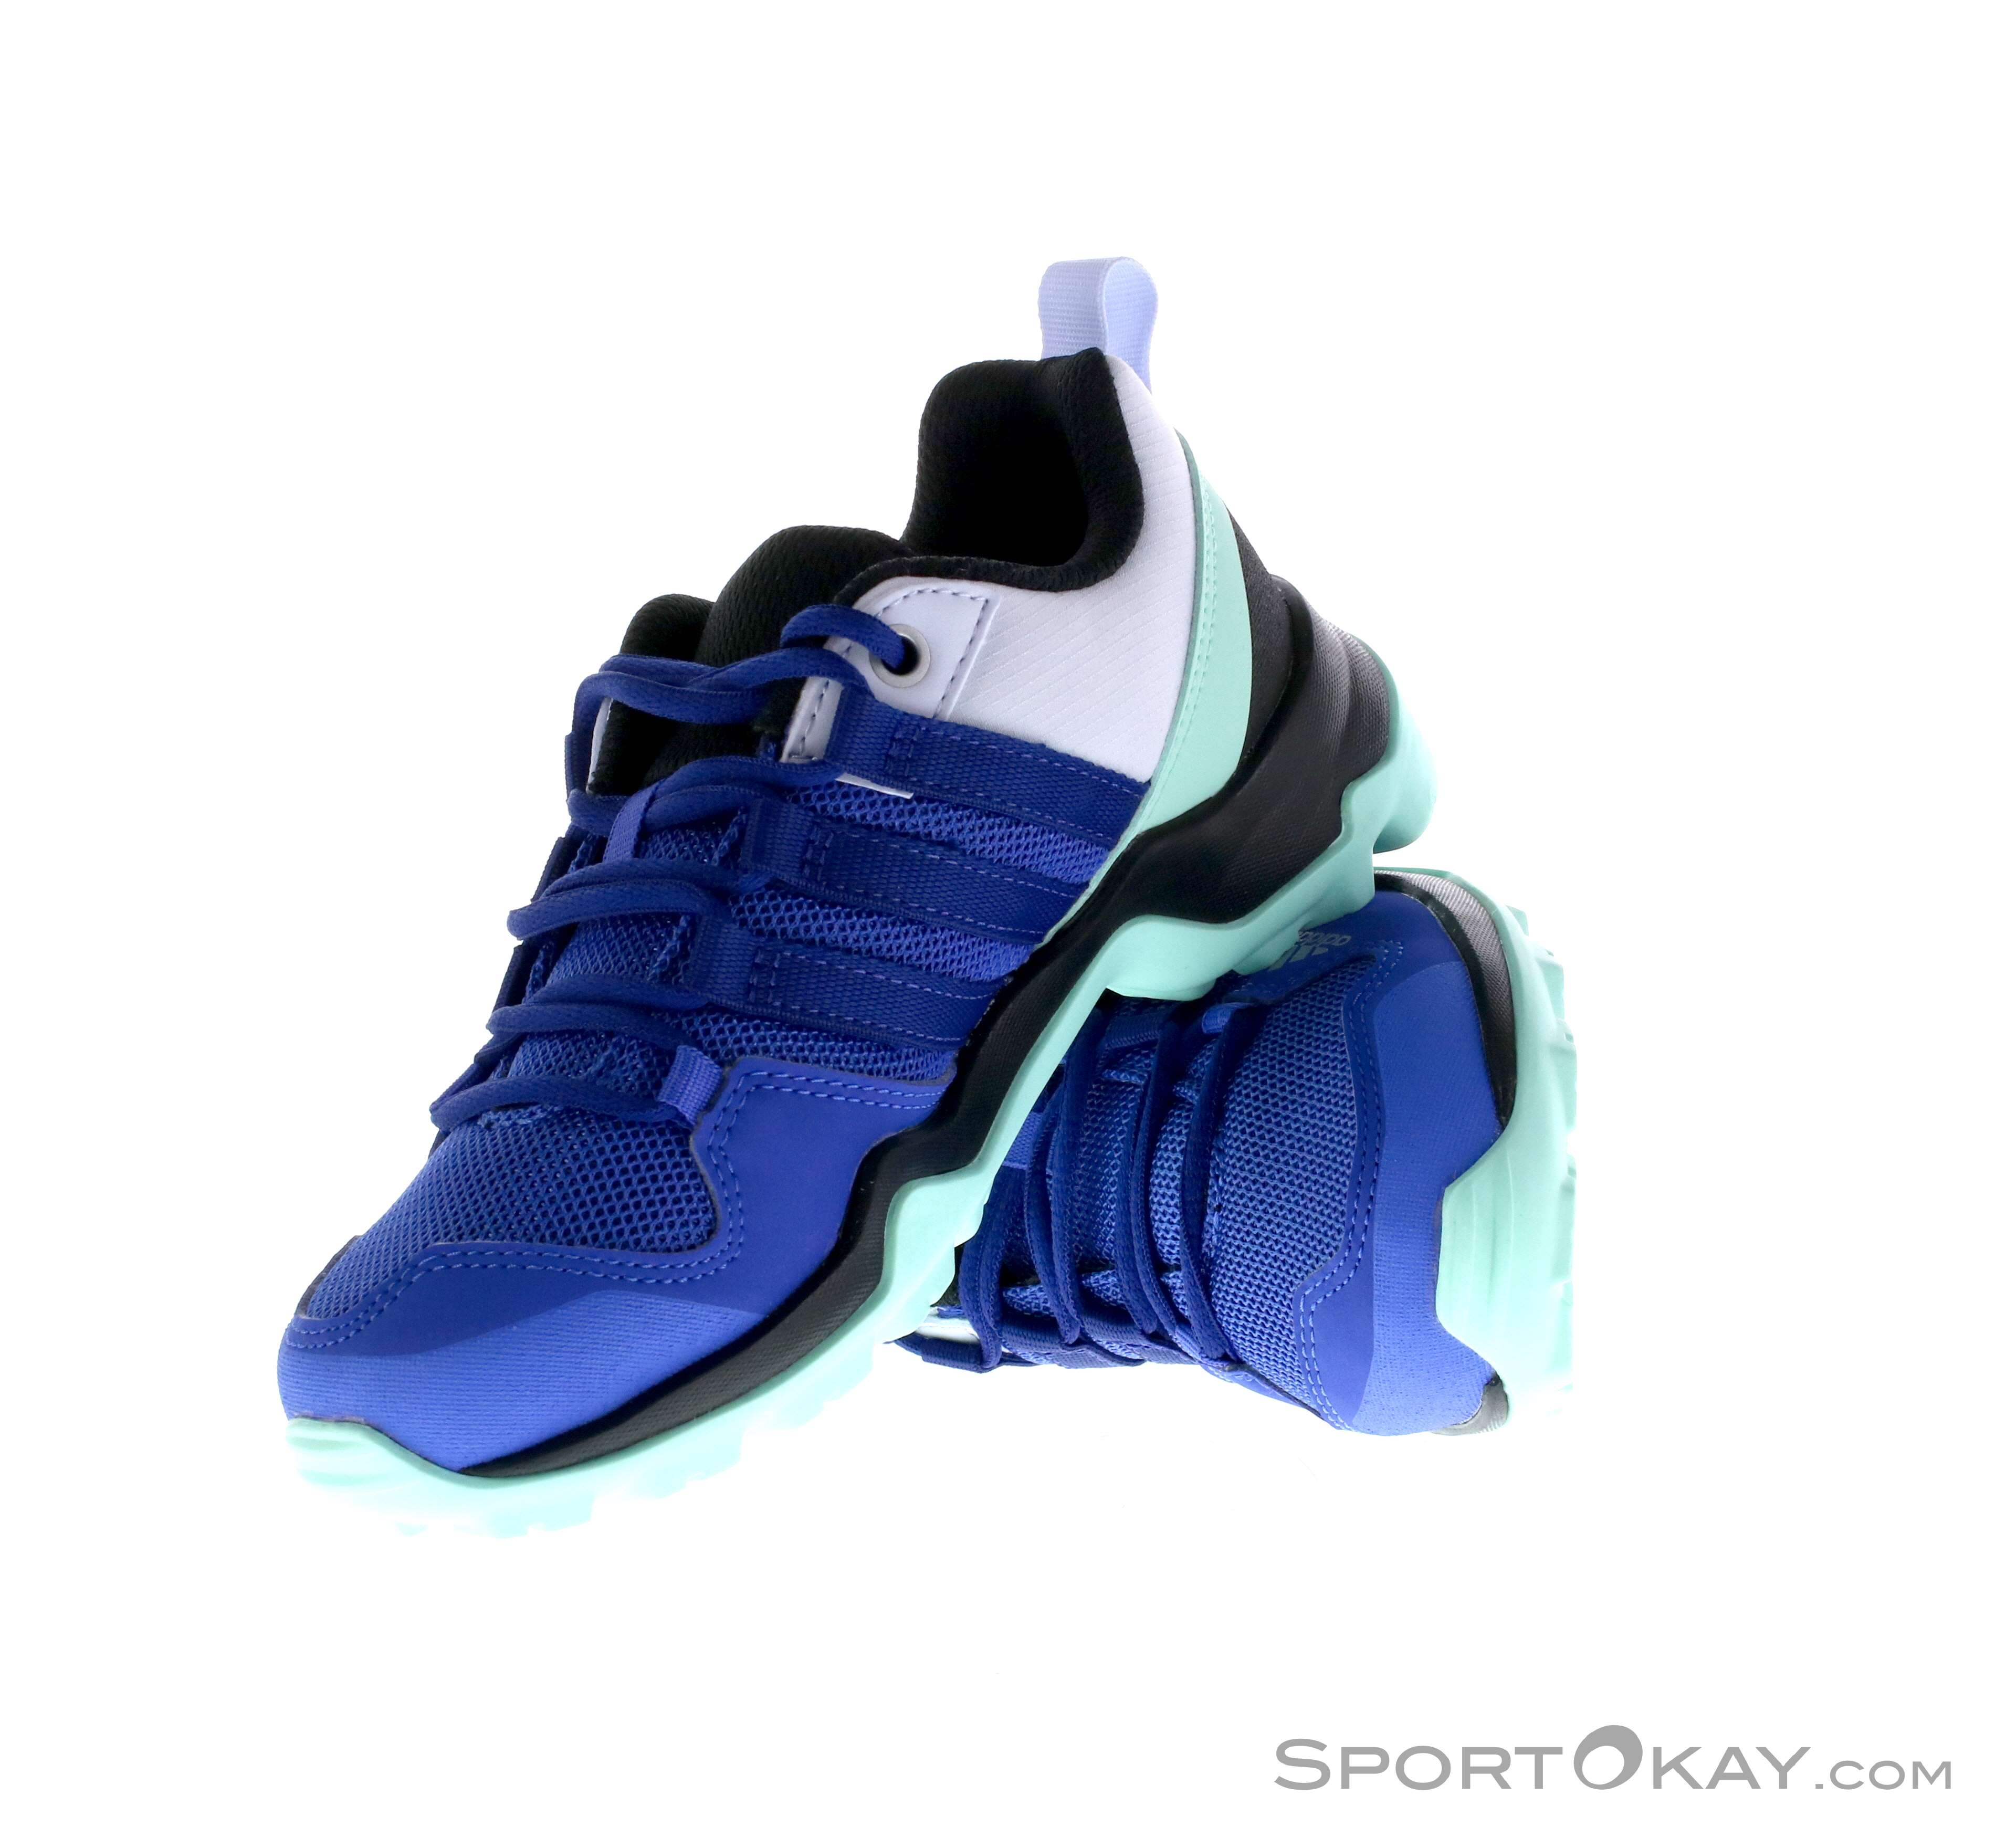 competitive price 5aea6 b78c9 adidas Terrex AX2R Bambini Scarpe da Trail Running, adidas, Blu, , Bambino,